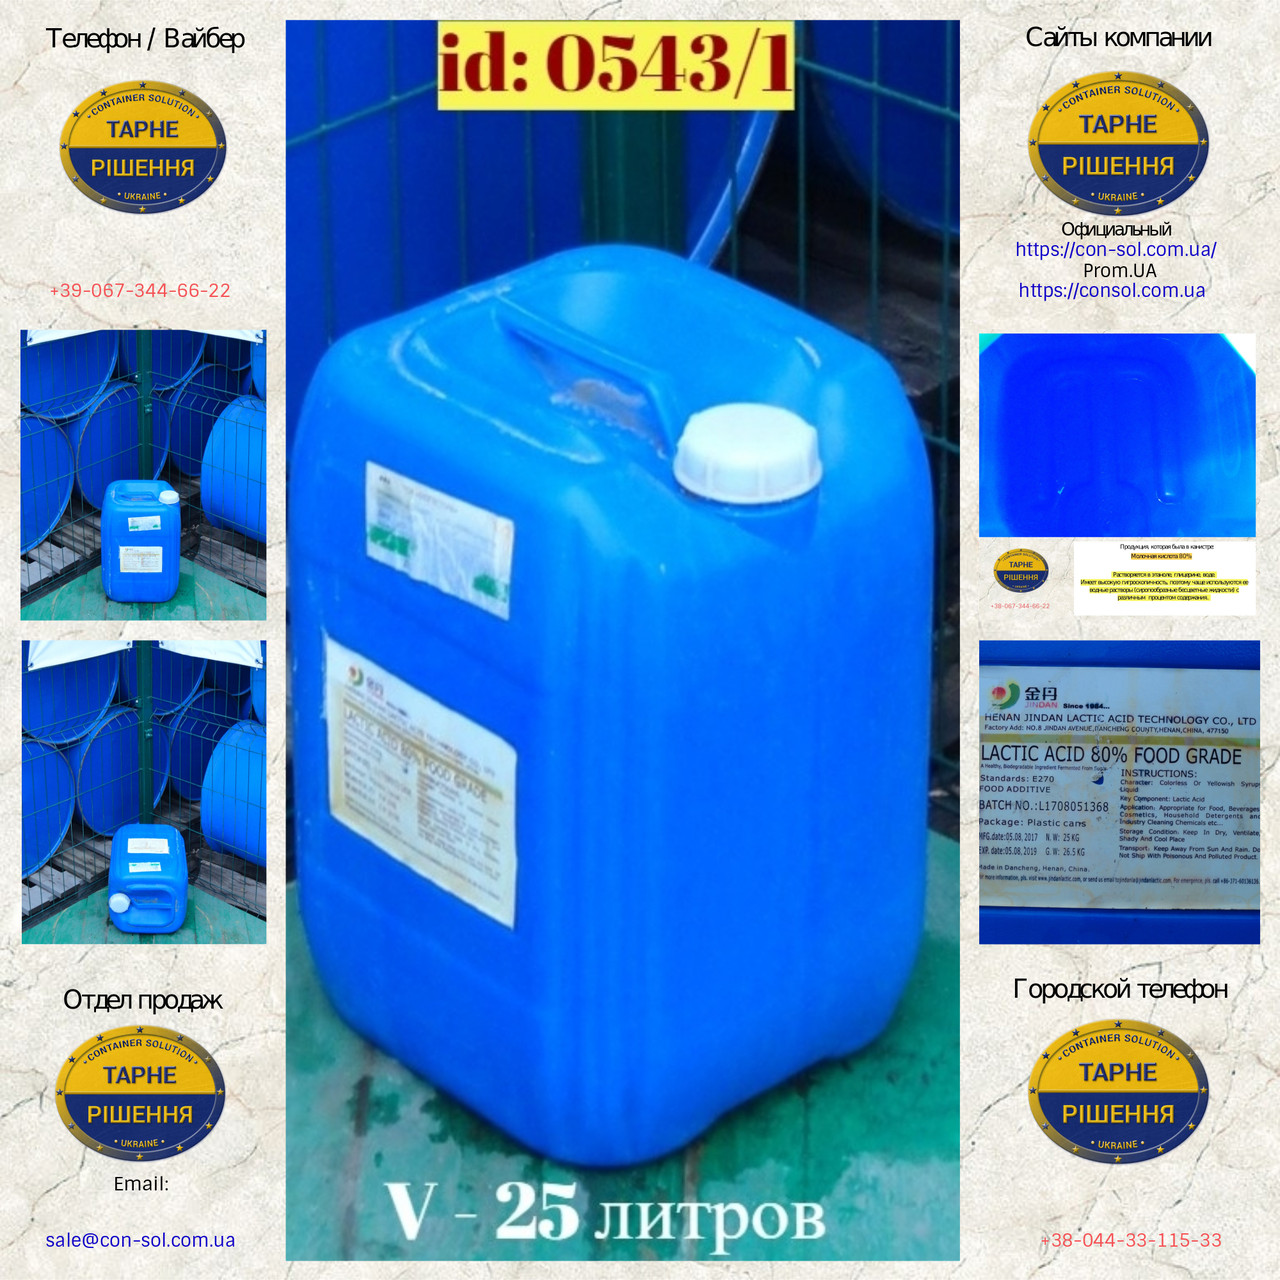 0543/1: Канистра (25 л.) б/у пластиковая ✦ Молочная кислота 80%